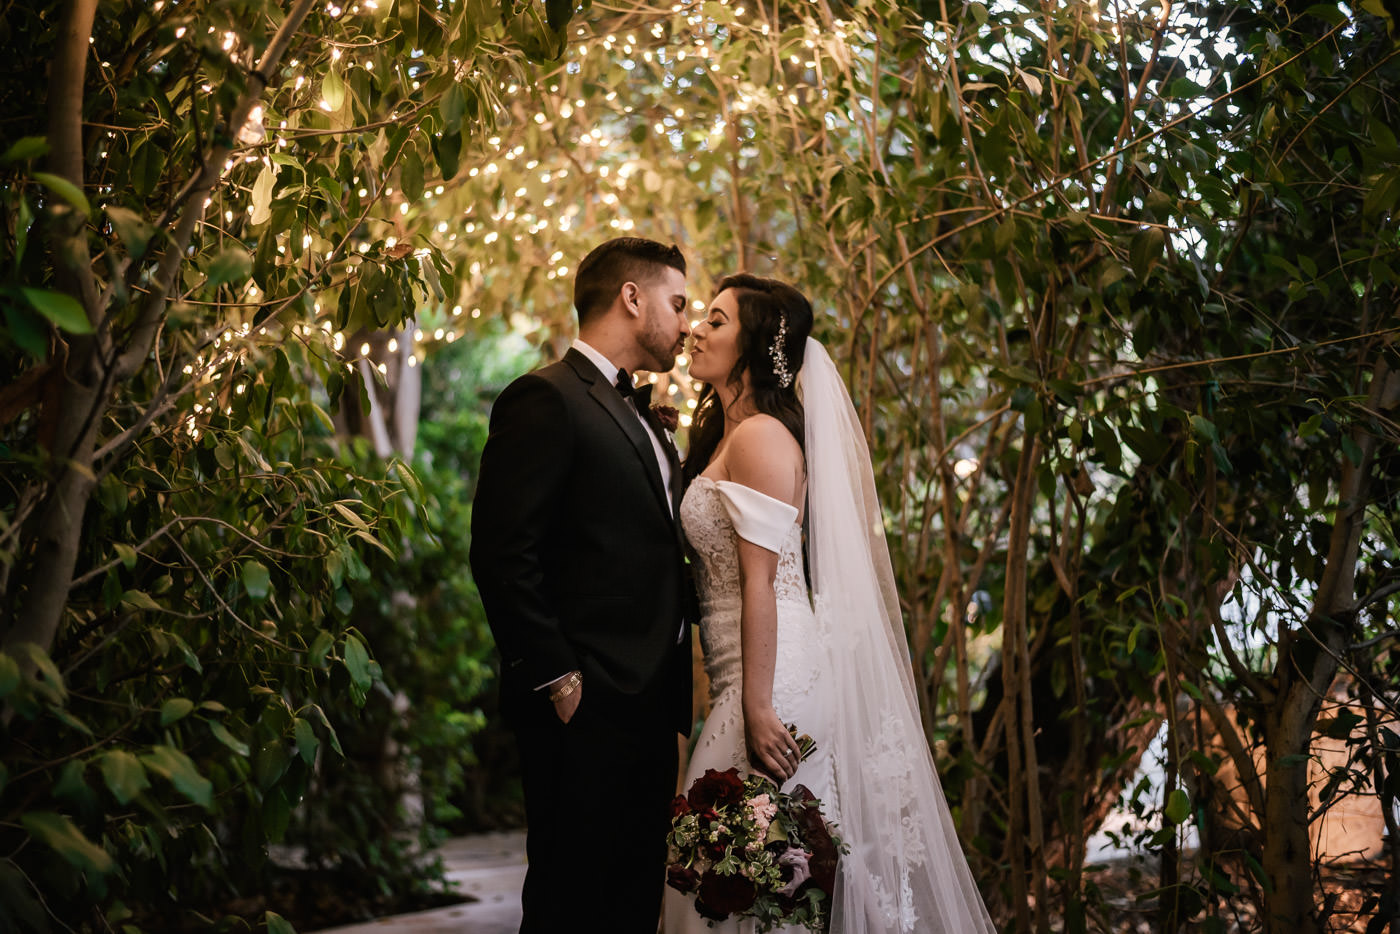 eden-gardens-wedding-photographer-romantic-85.jpg